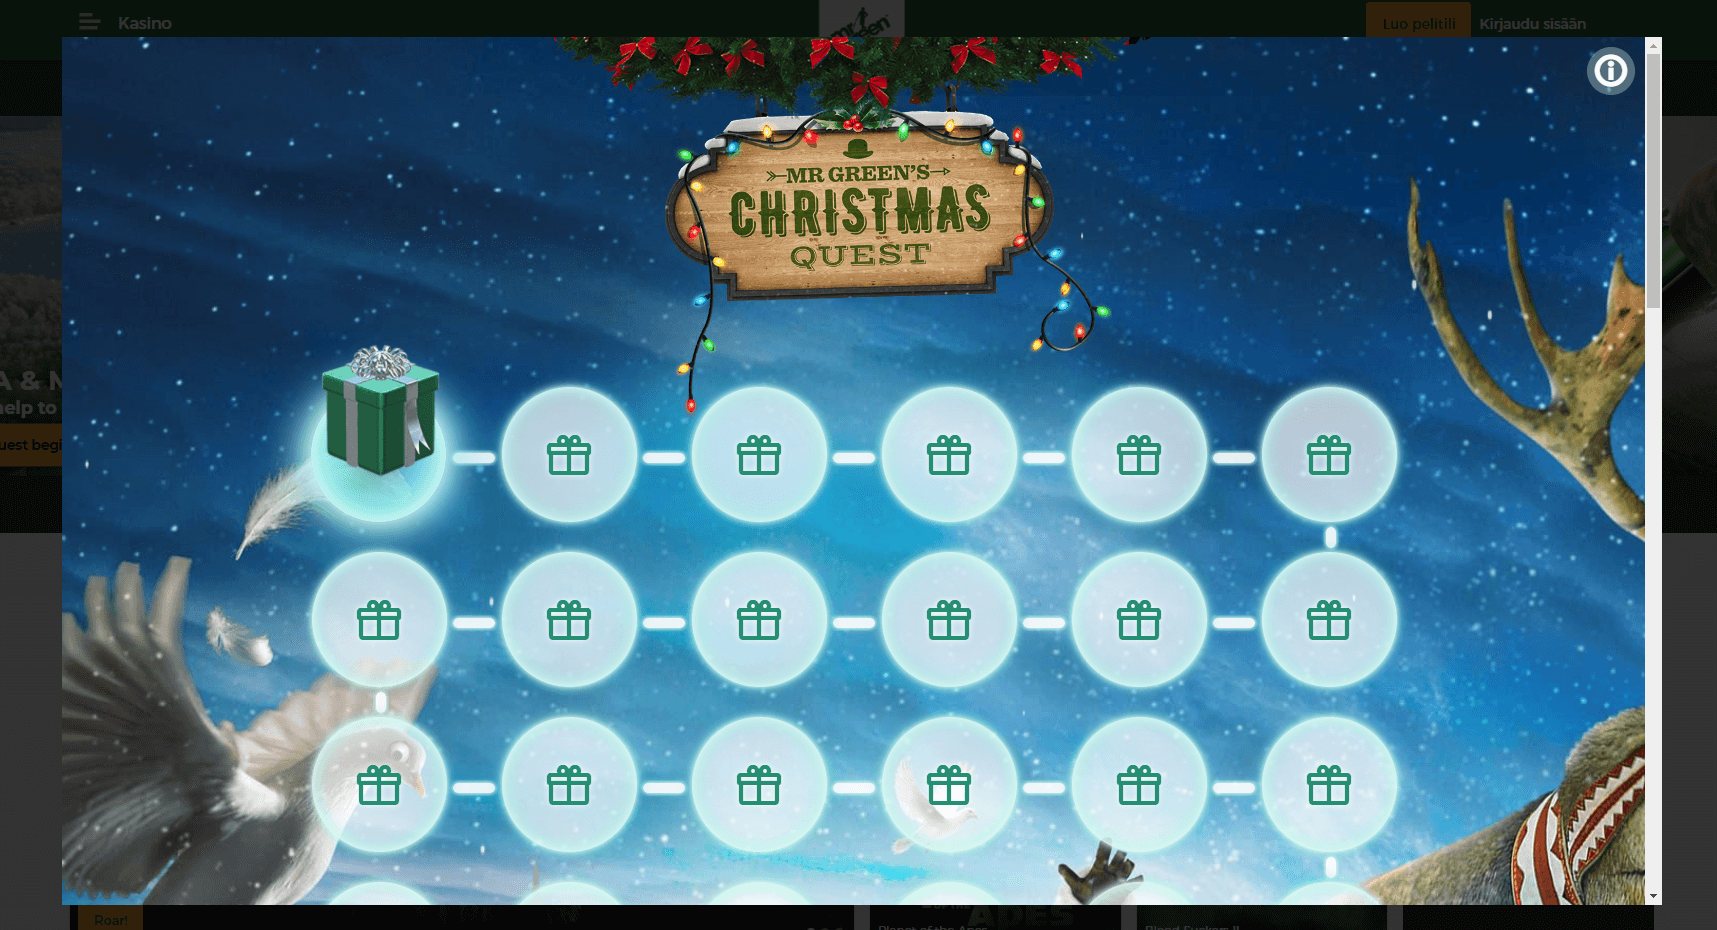 MrGreen joulukampanja